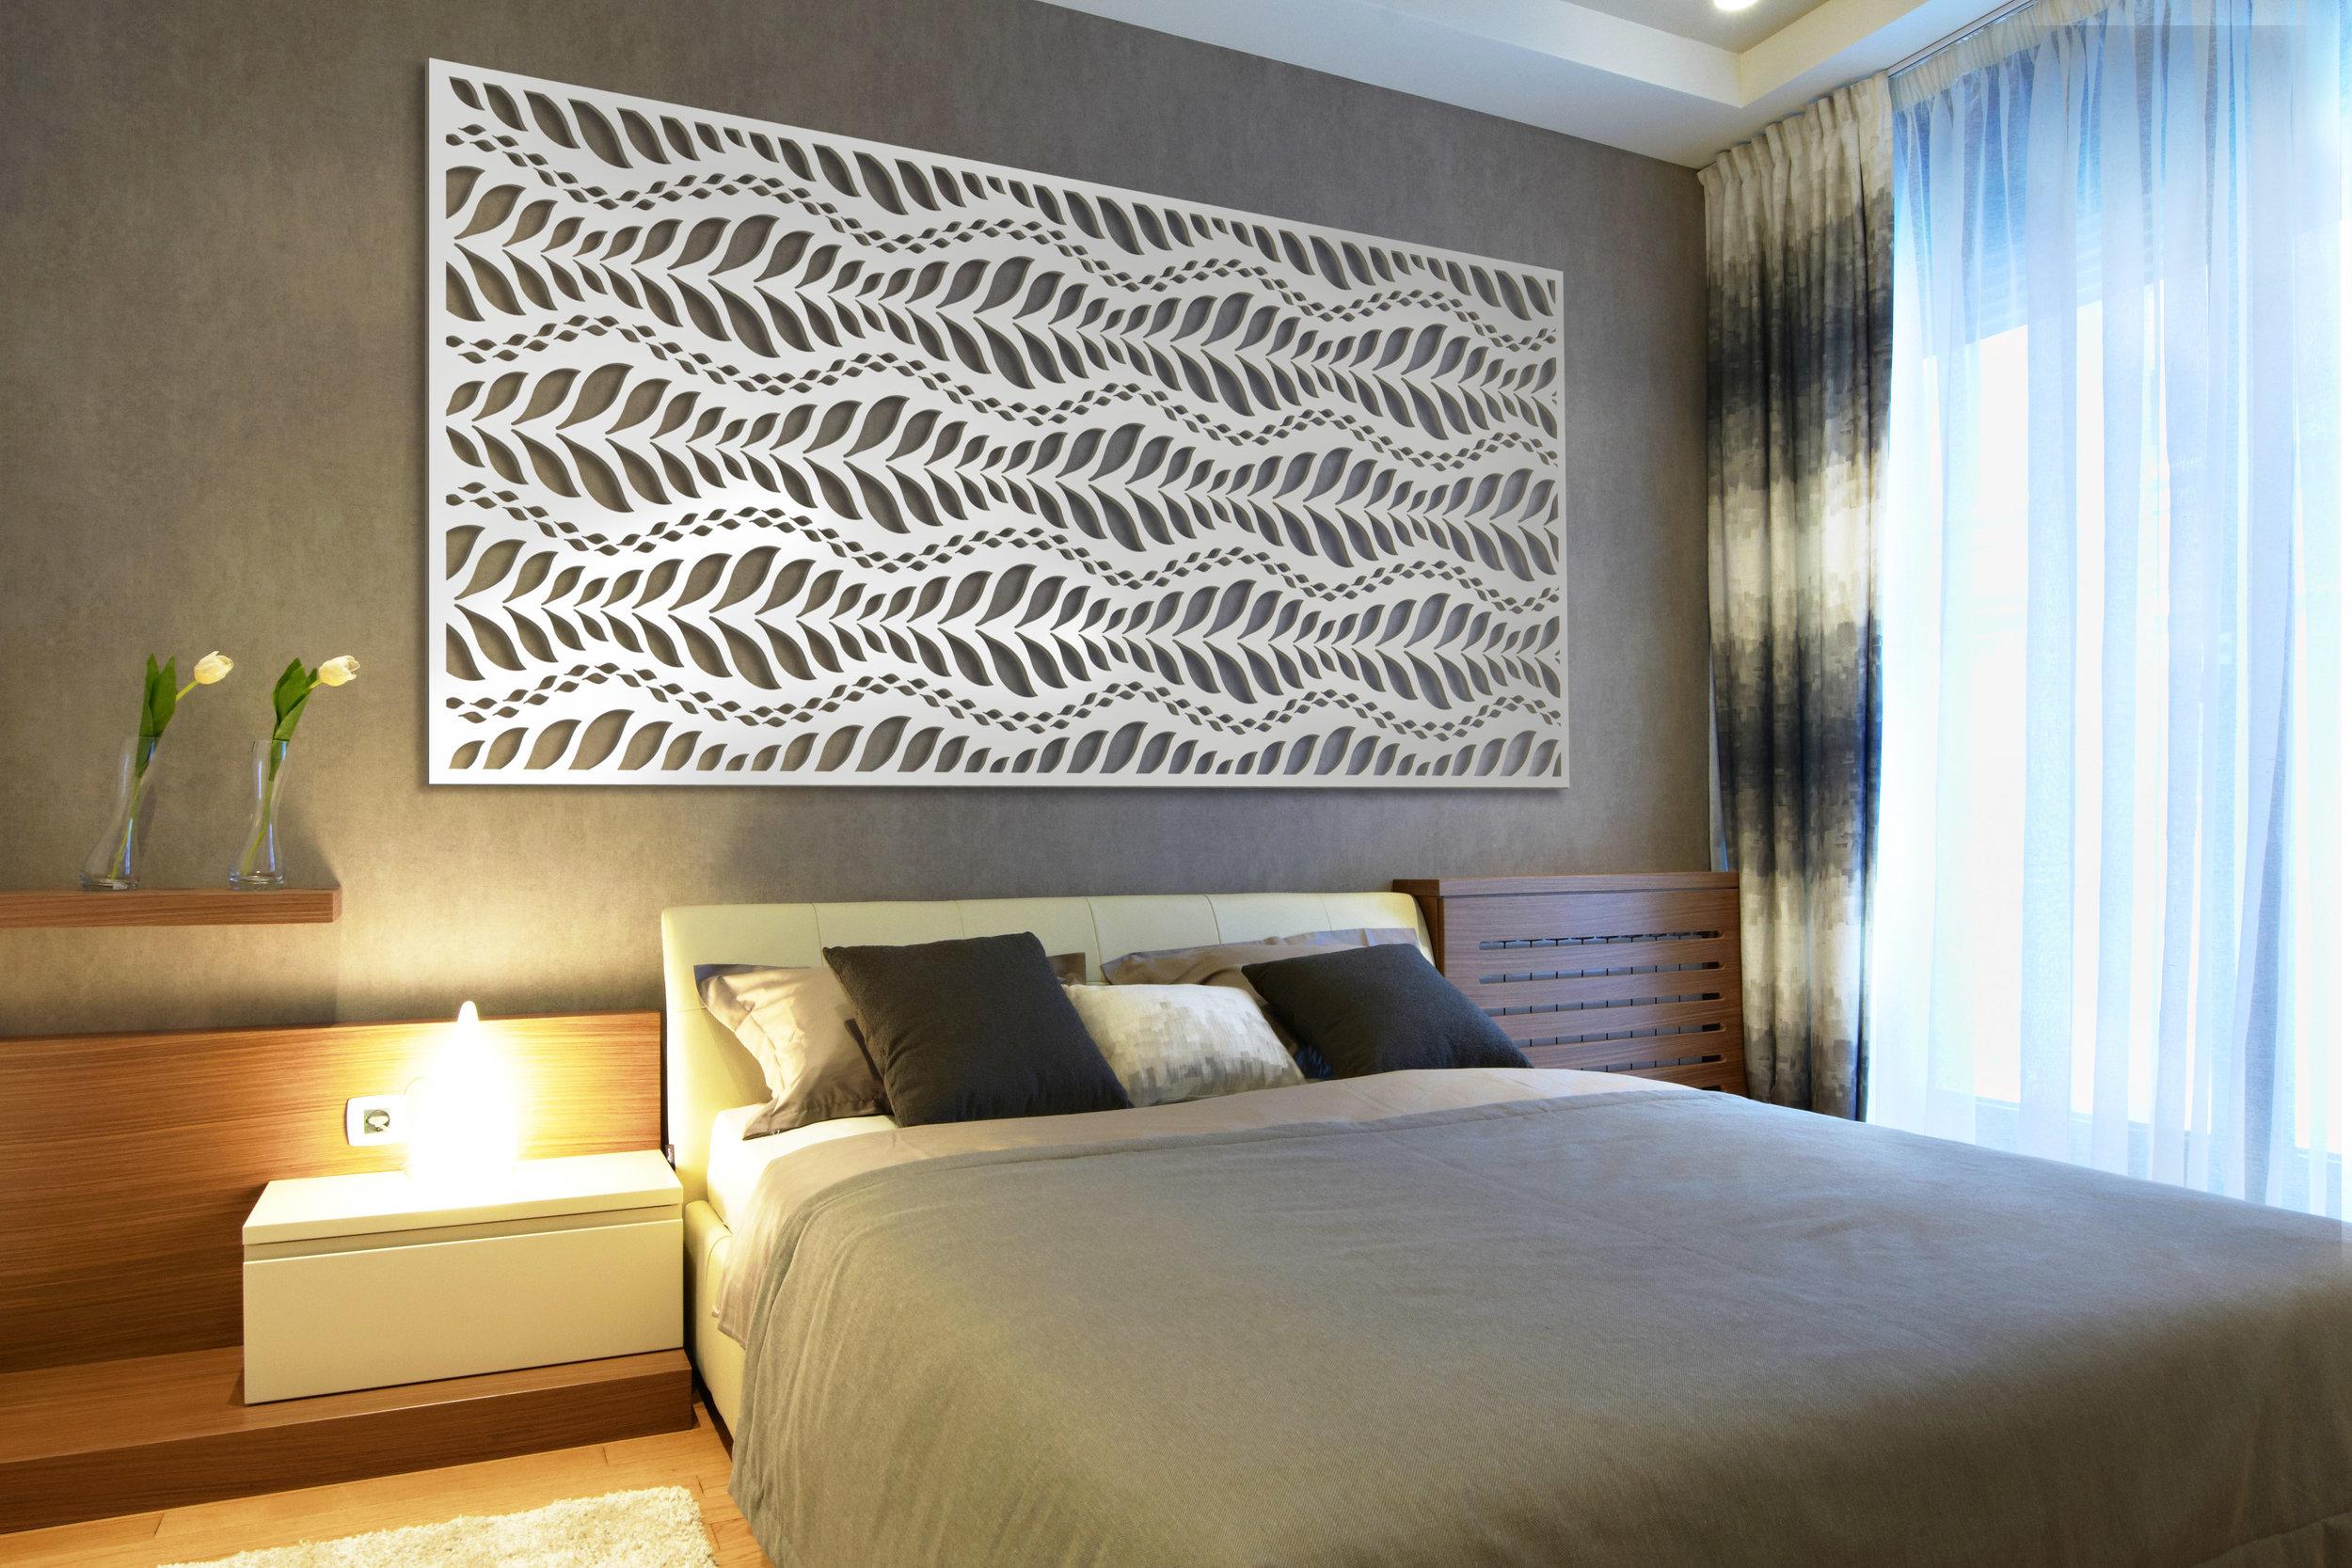 Installation Rendering C   La Jolla decorative hotel wall panel - painted